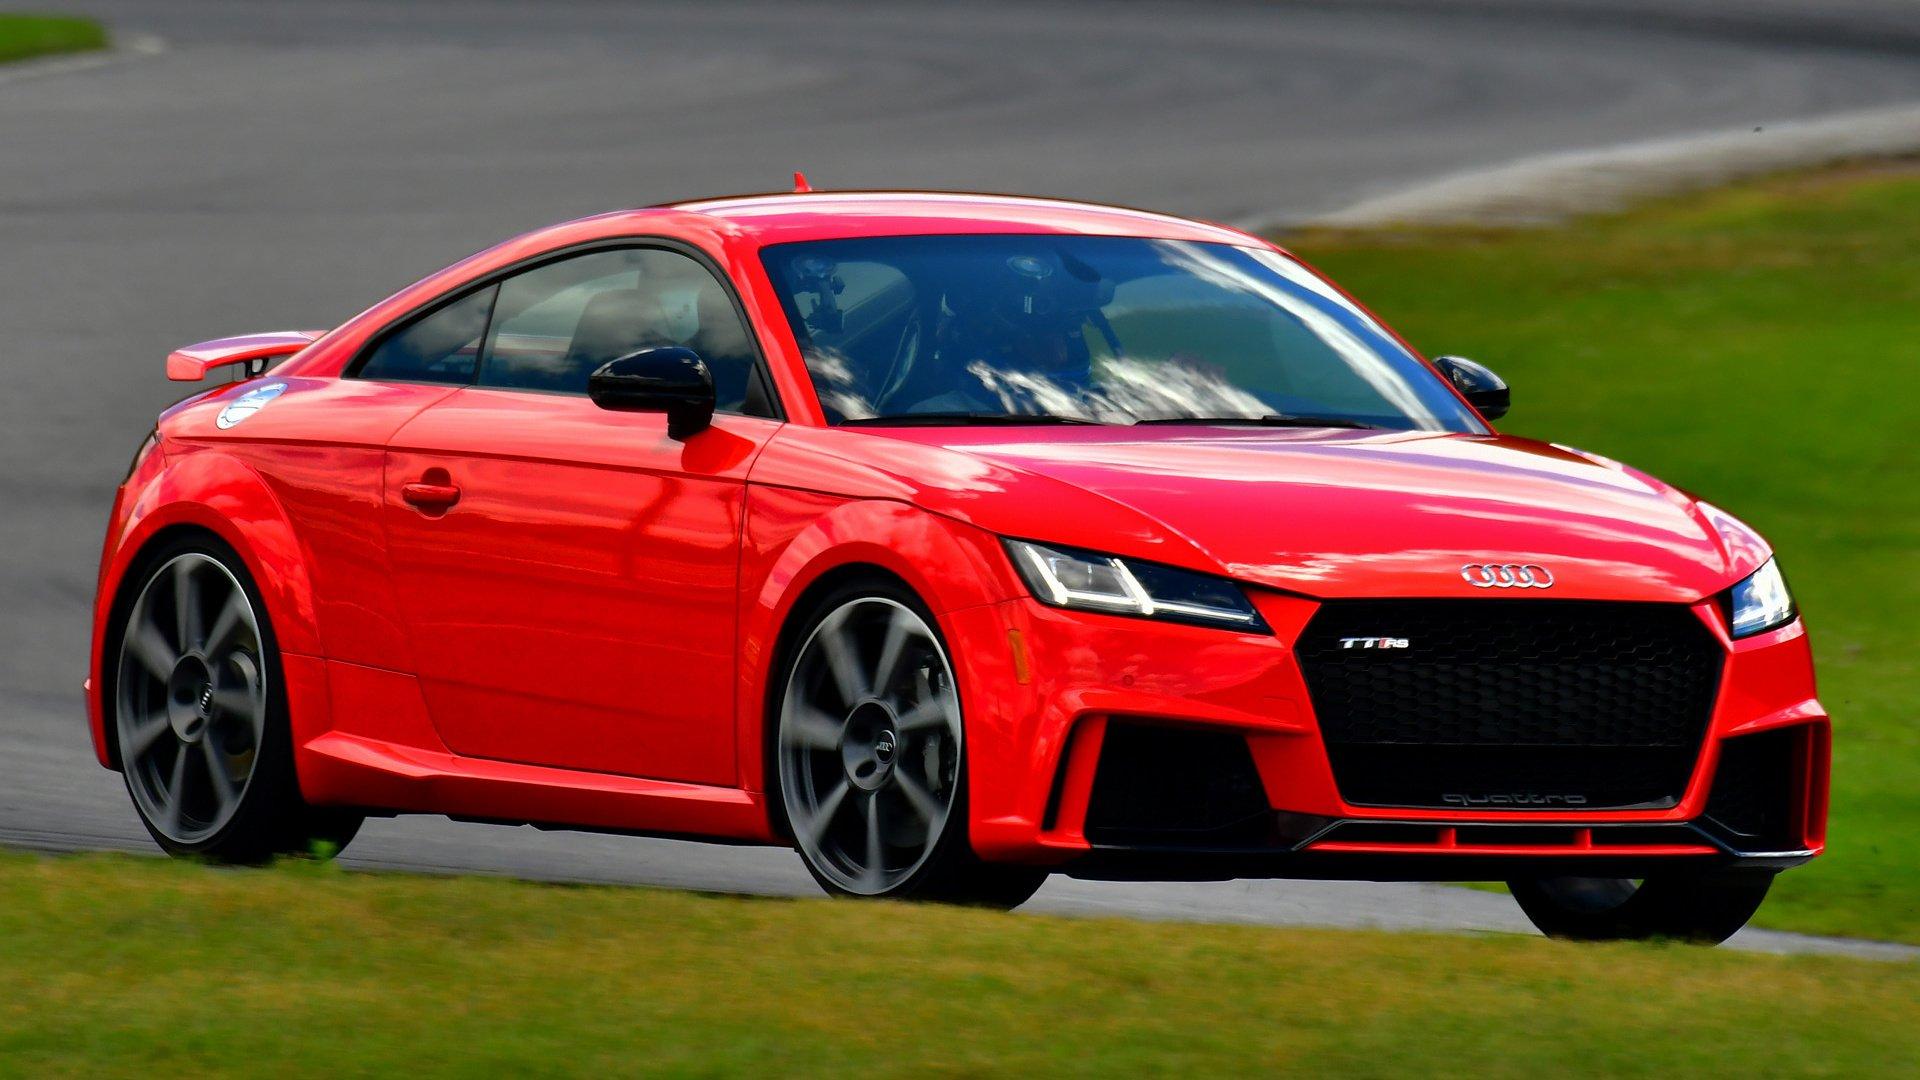 Vehicles - Audi TT RS  Coupé Sport Car Compact Car Red Car Car Wallpaper